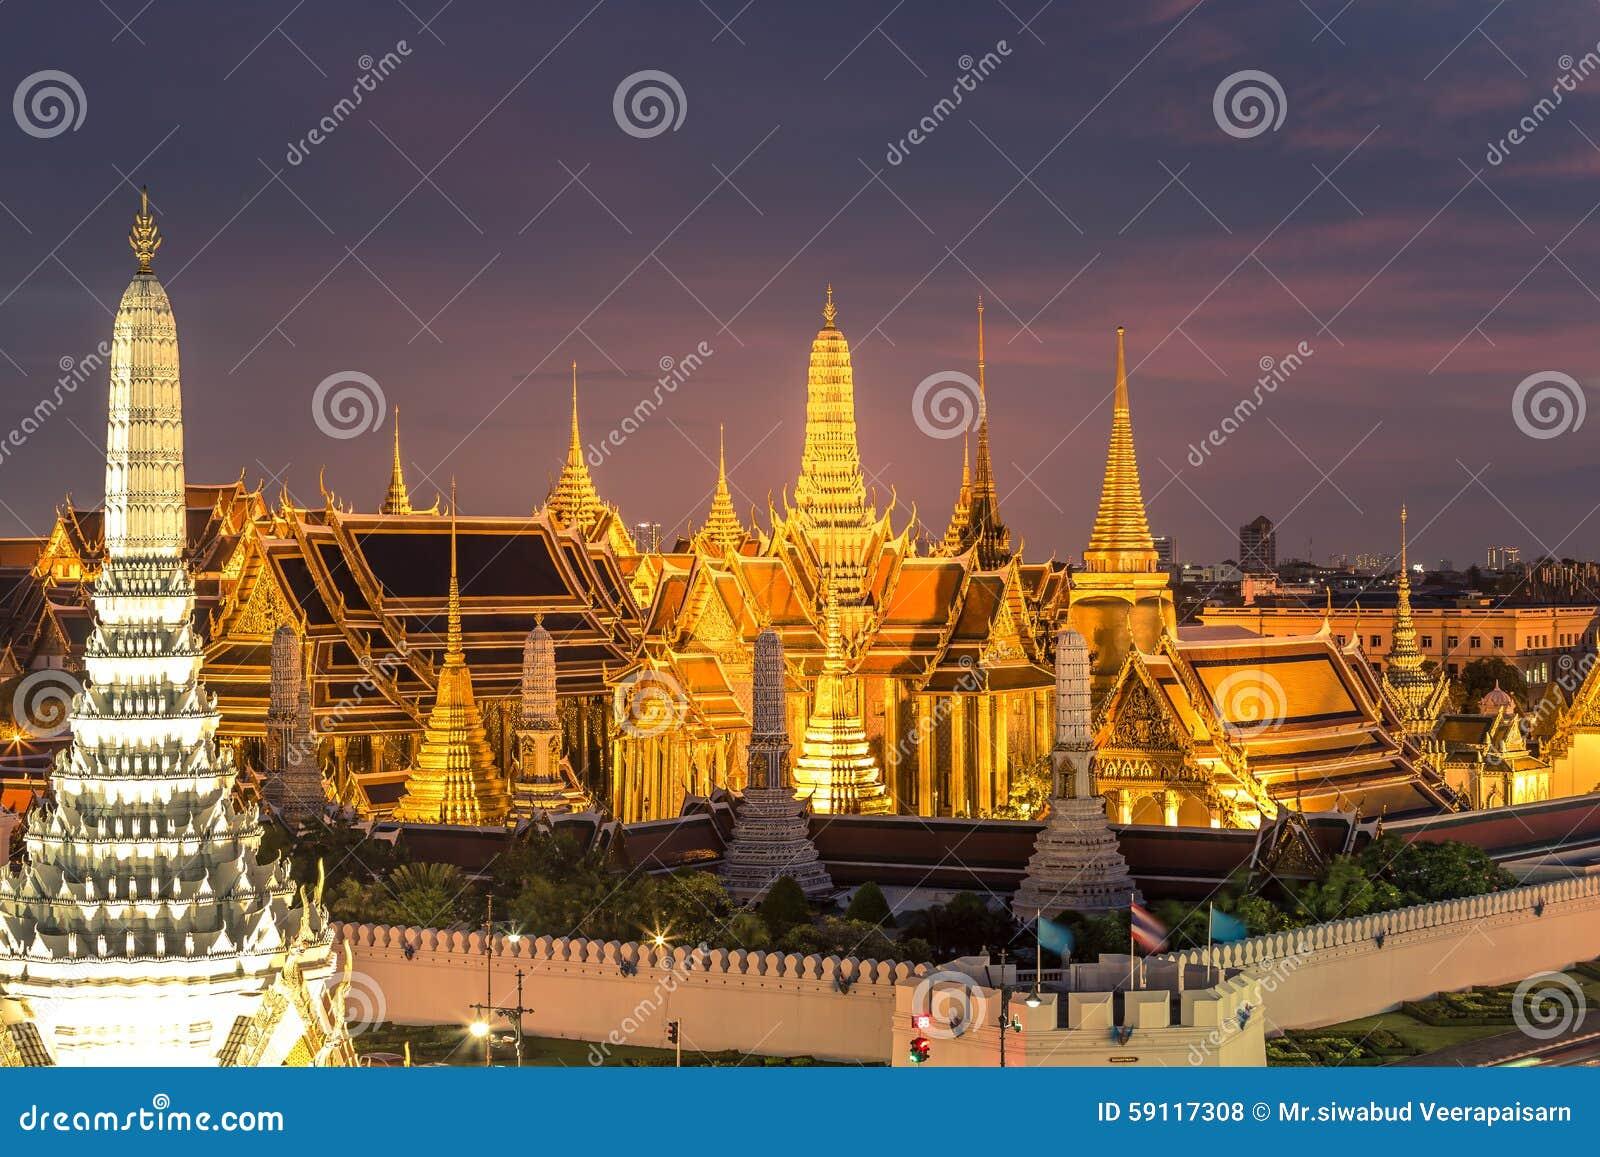 how to get to grand palace bangkok